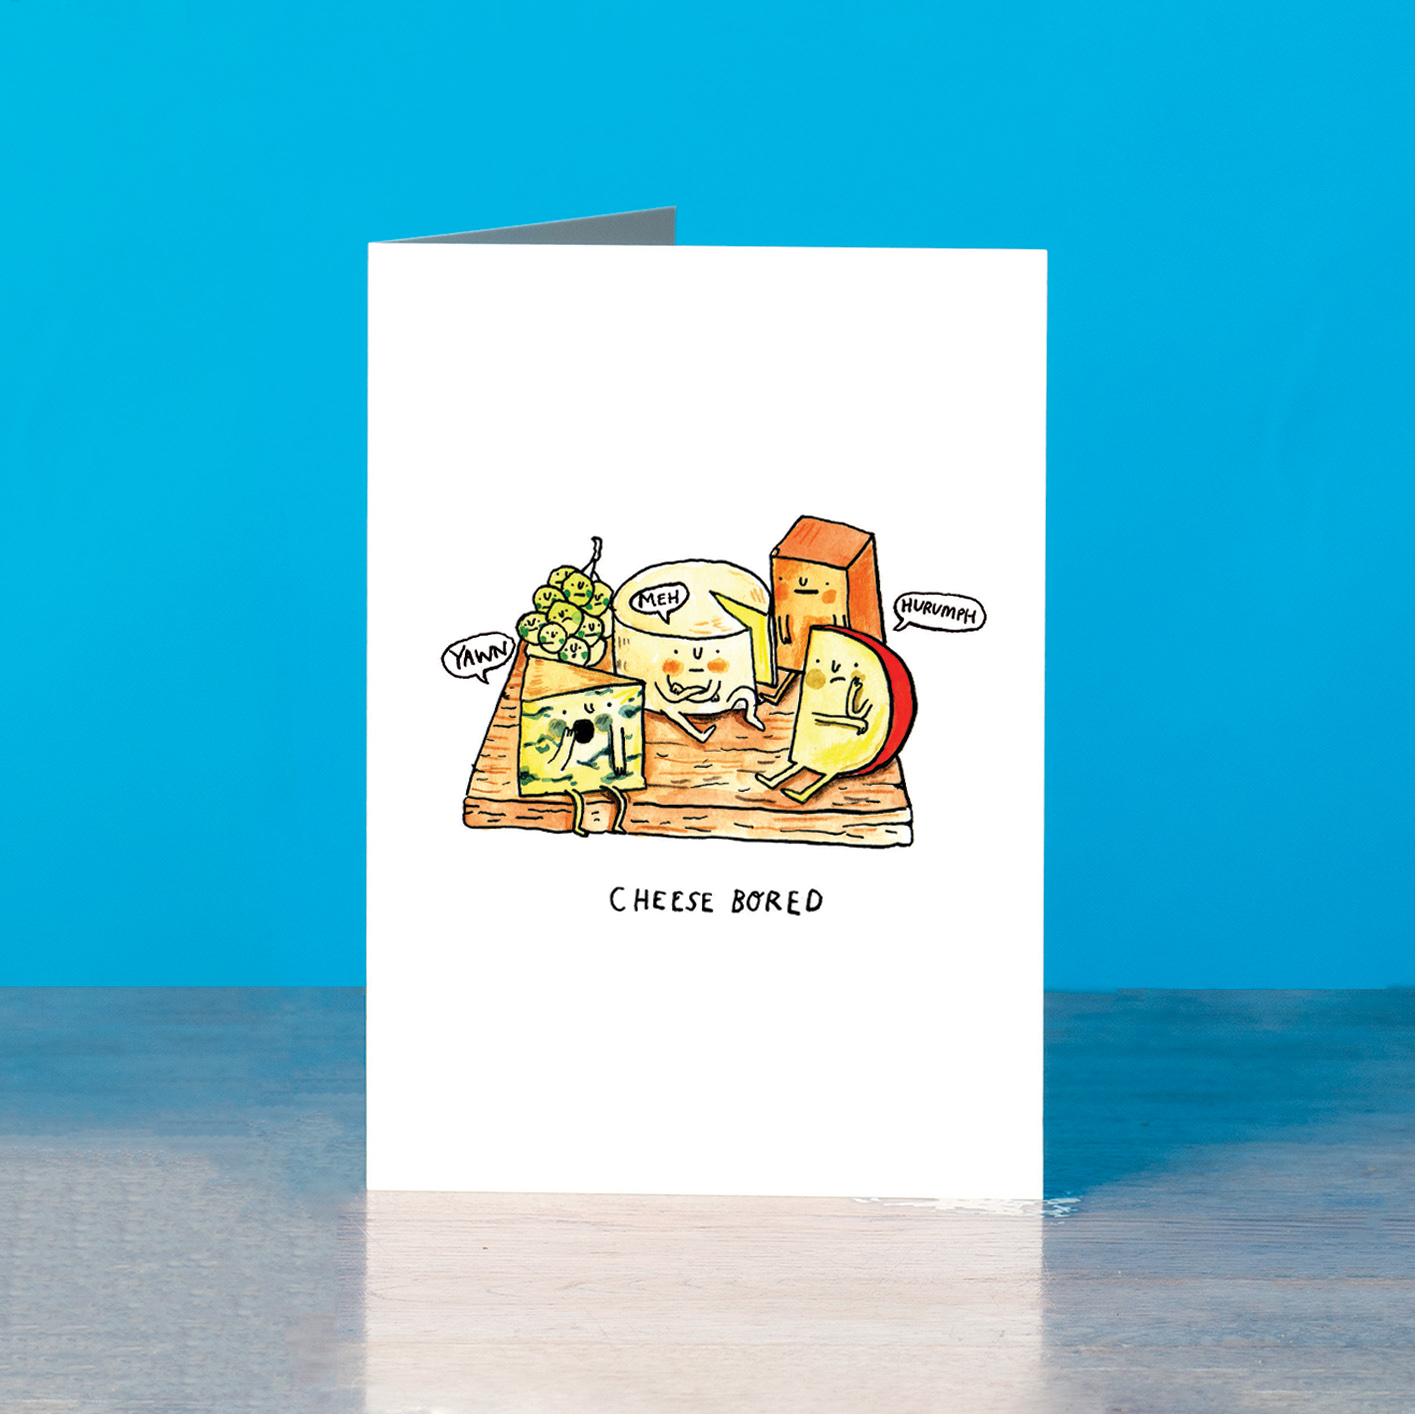 Cheese-Board_-Romantic-cheese-pun-greetings-card_SM69_OT